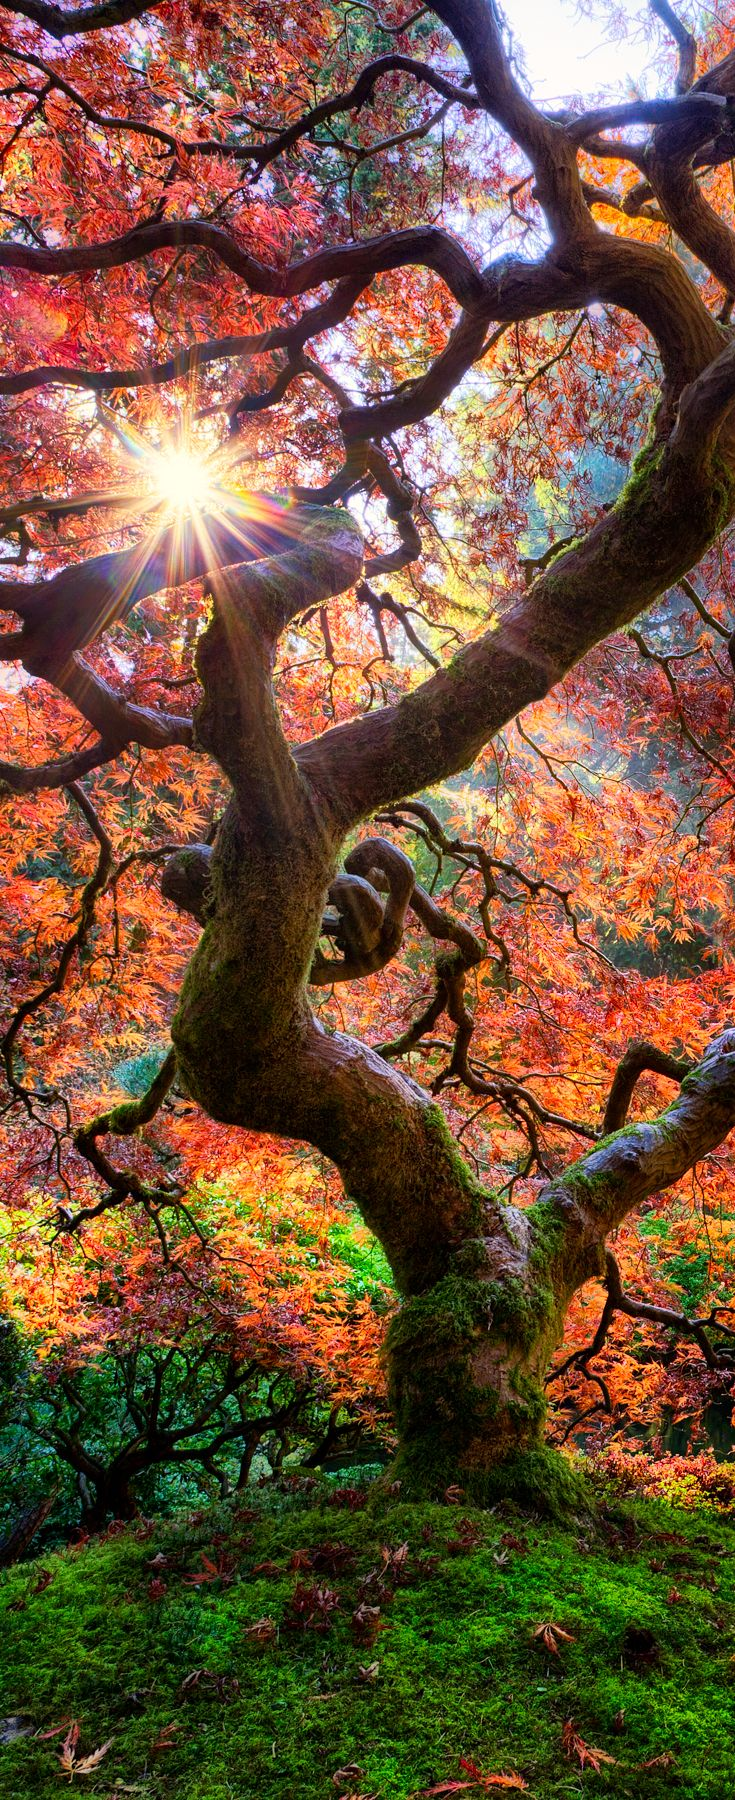 portland oregon japanese garden | Photographs | Pinterest | Portland ...